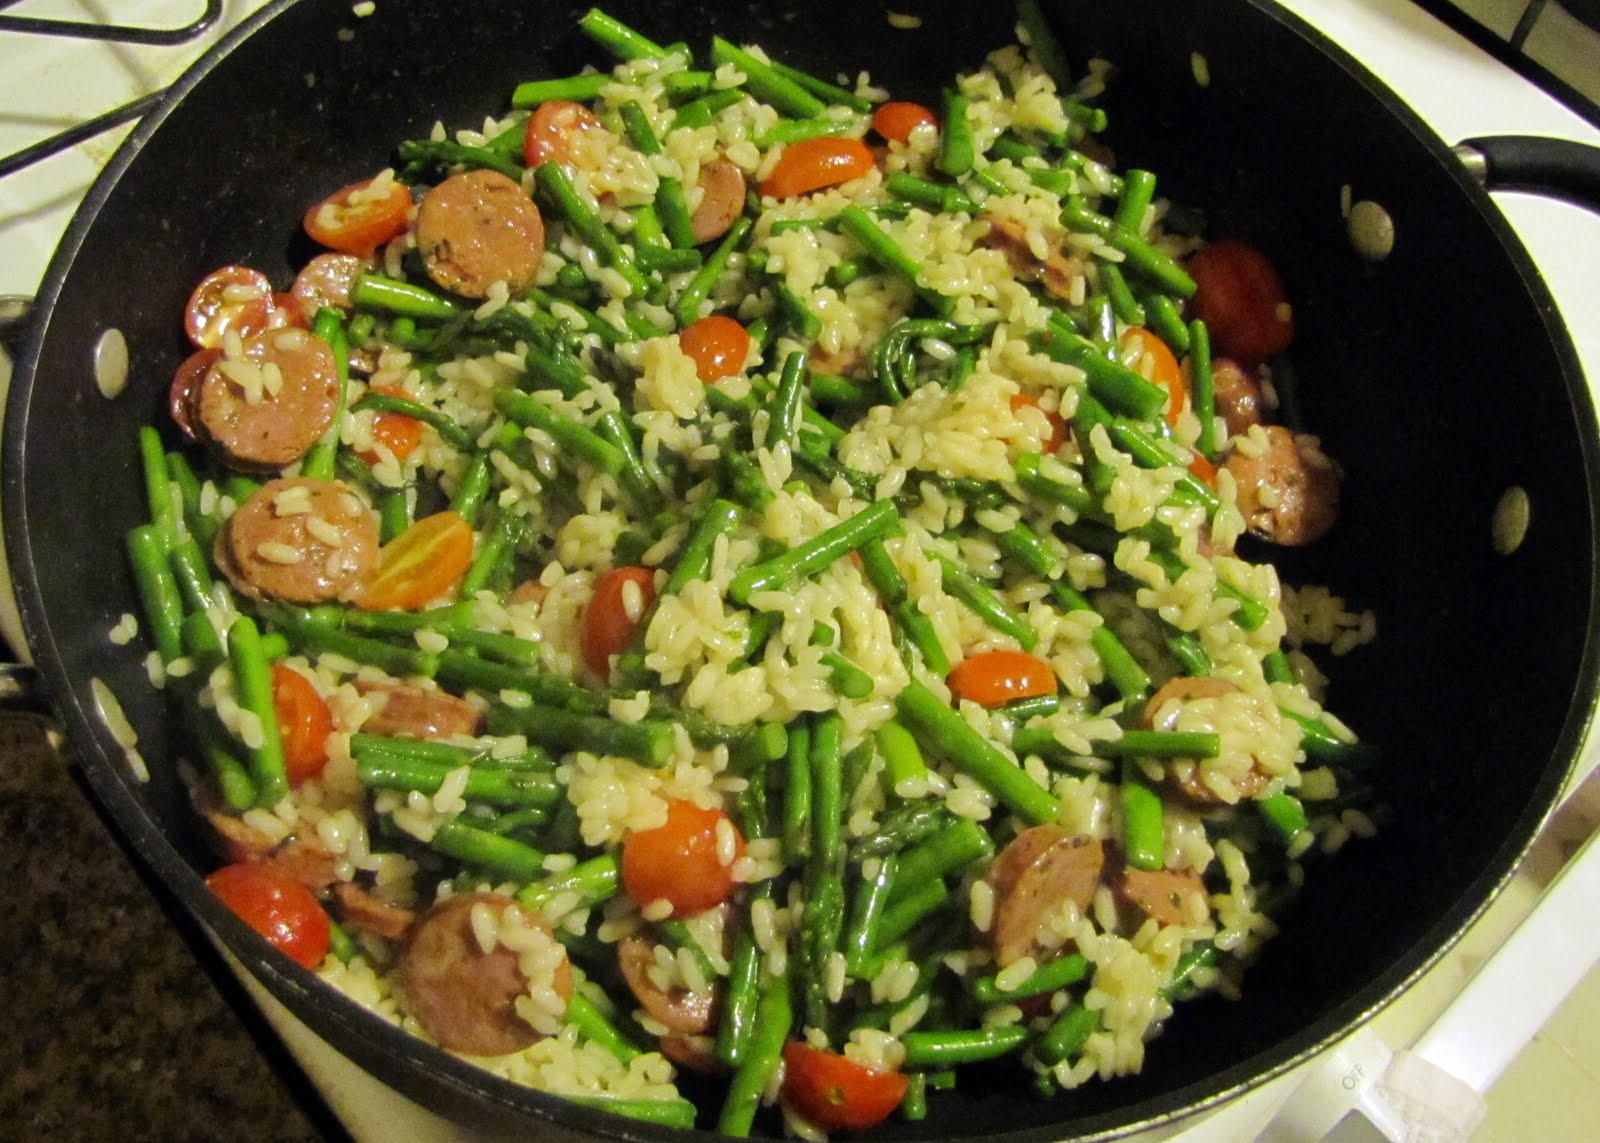 how to cook arborio rice like regular rice